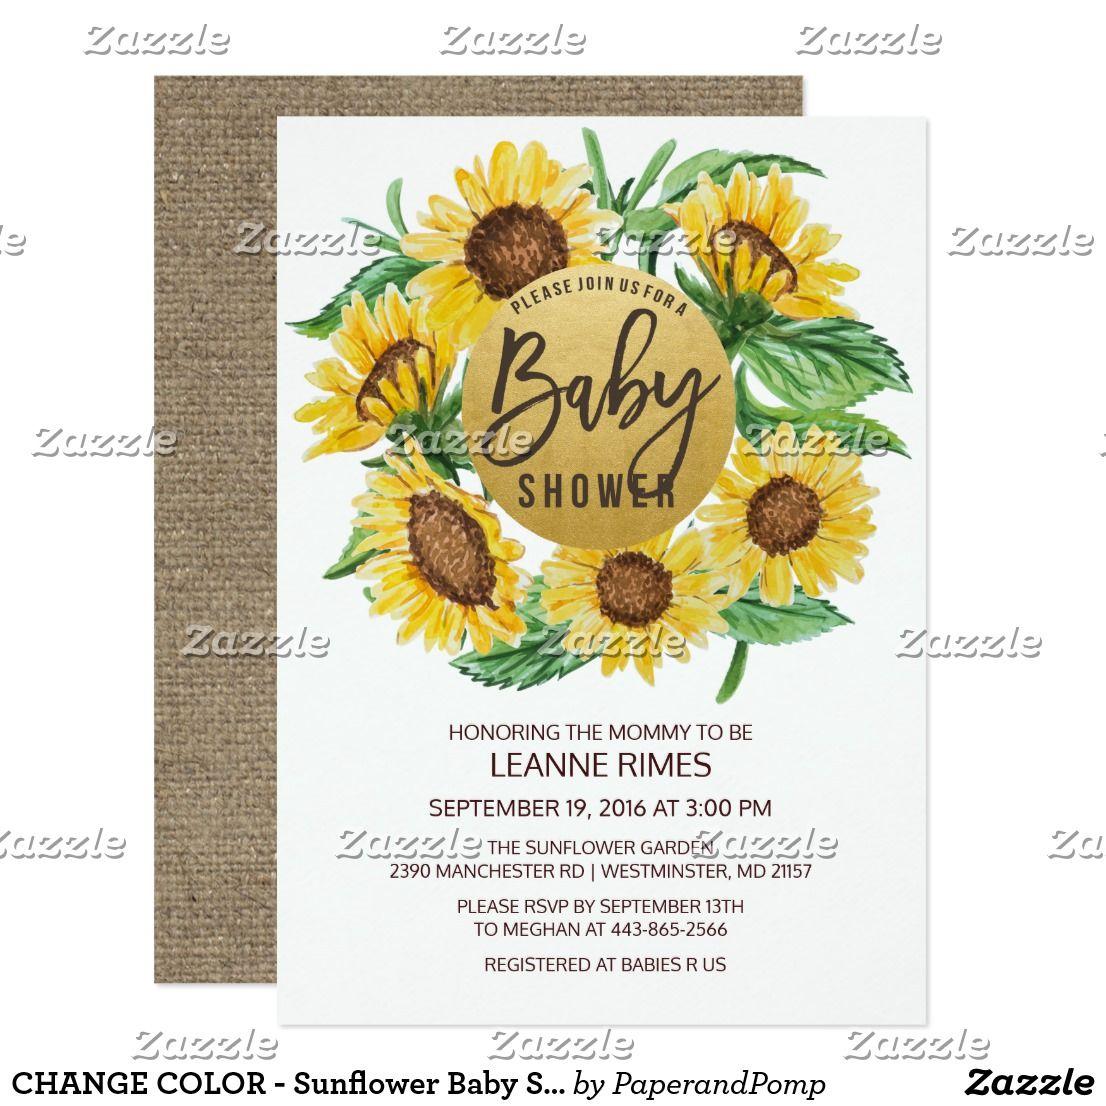 CHANGE COLOR - Sunflower Baby Shower Invitation | Sunflower baby ...